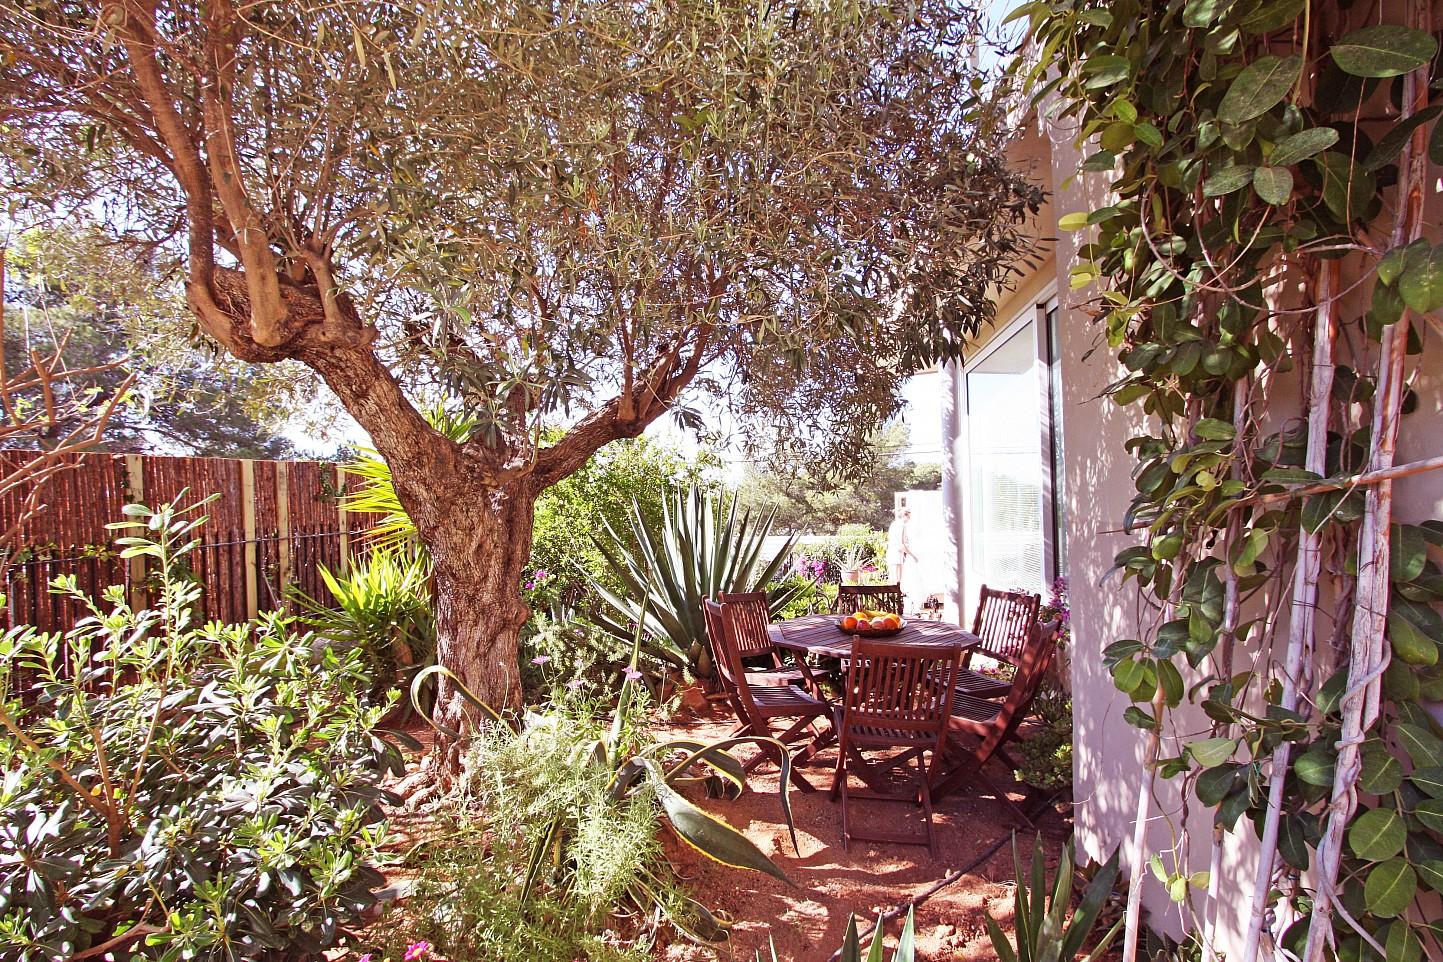 Jardins rodejats pels arbres